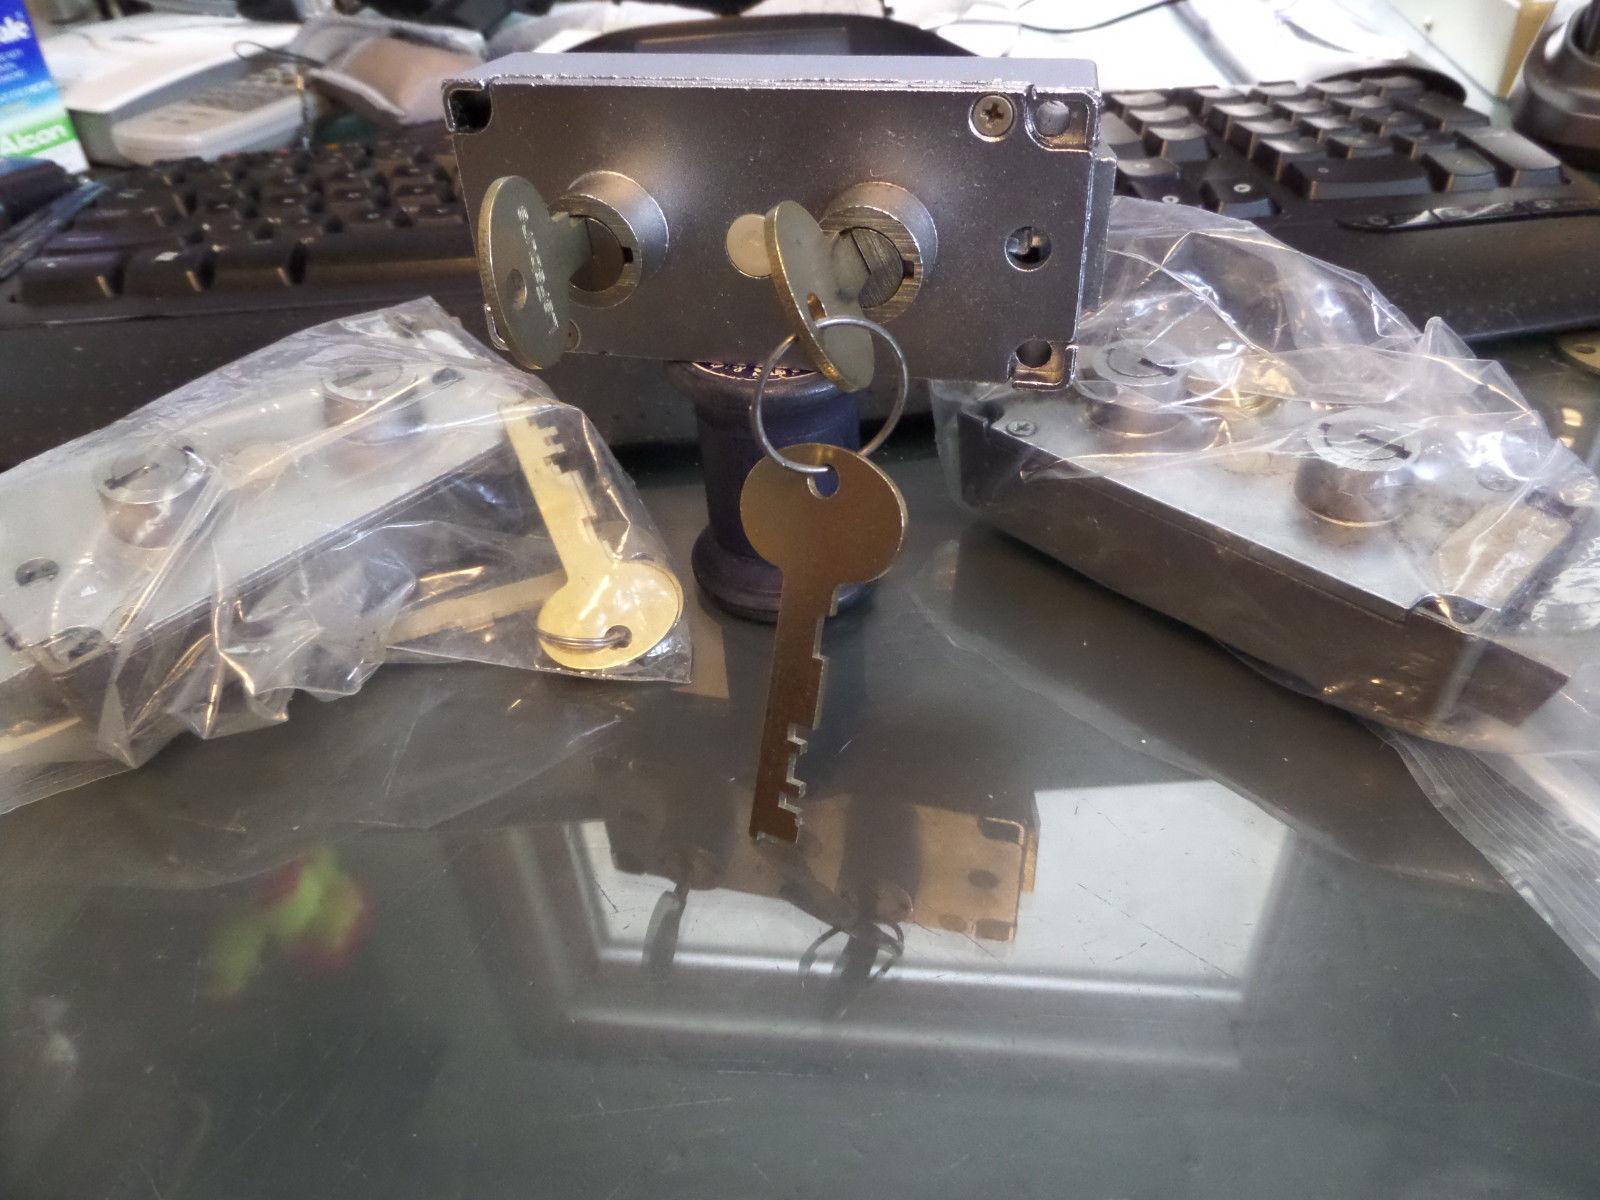 Locksmith Security LeFebure 7737 safe deposit dual control lock. New Keys silver